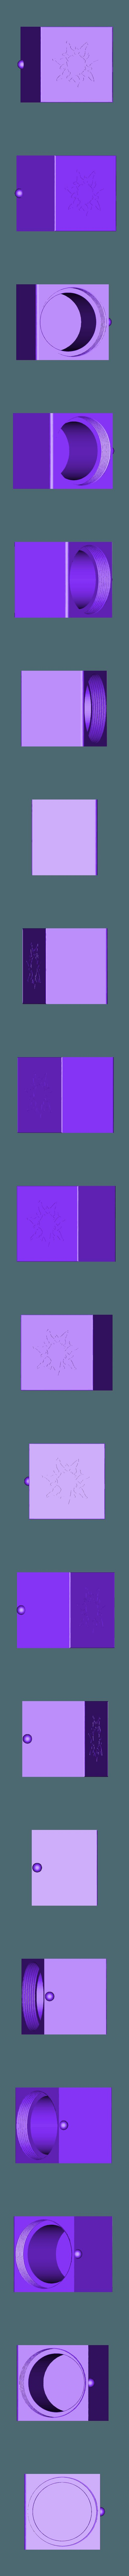 cube-02 v8_cup_stl.stl Descargar archivo OBJ Caja de regalo Caja secreta pequeña caja secreta Modelo de impresión en 3D • Modelo para imprimir en 3D, Dzusto